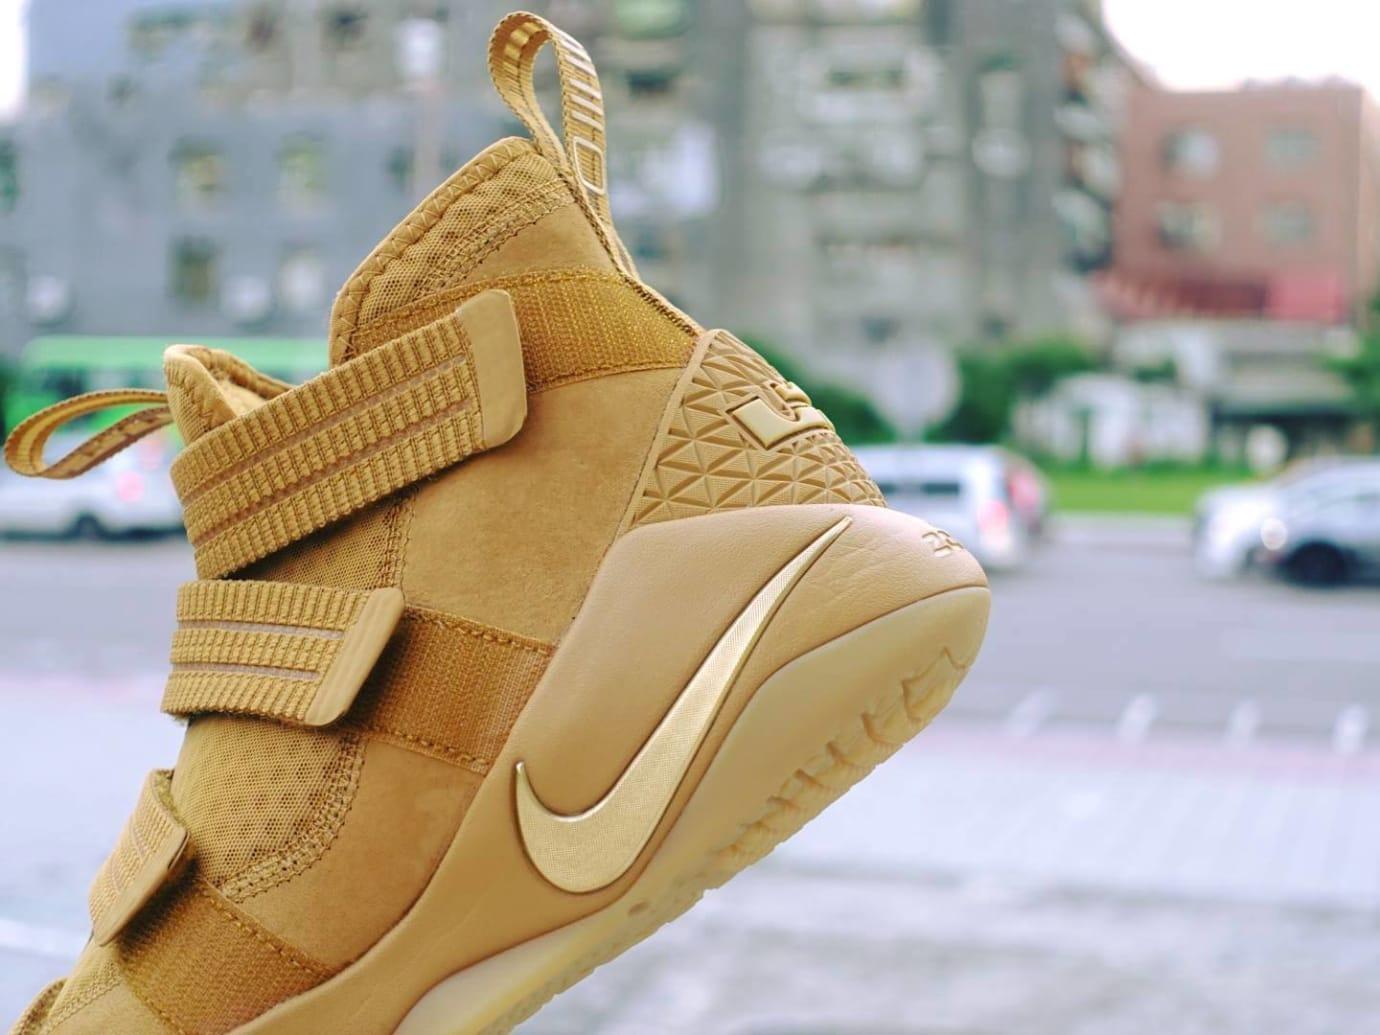 2c2fddea2fe Nike LeBron Soldier 11 SFG Wheat Release Date 897647-700 (4)